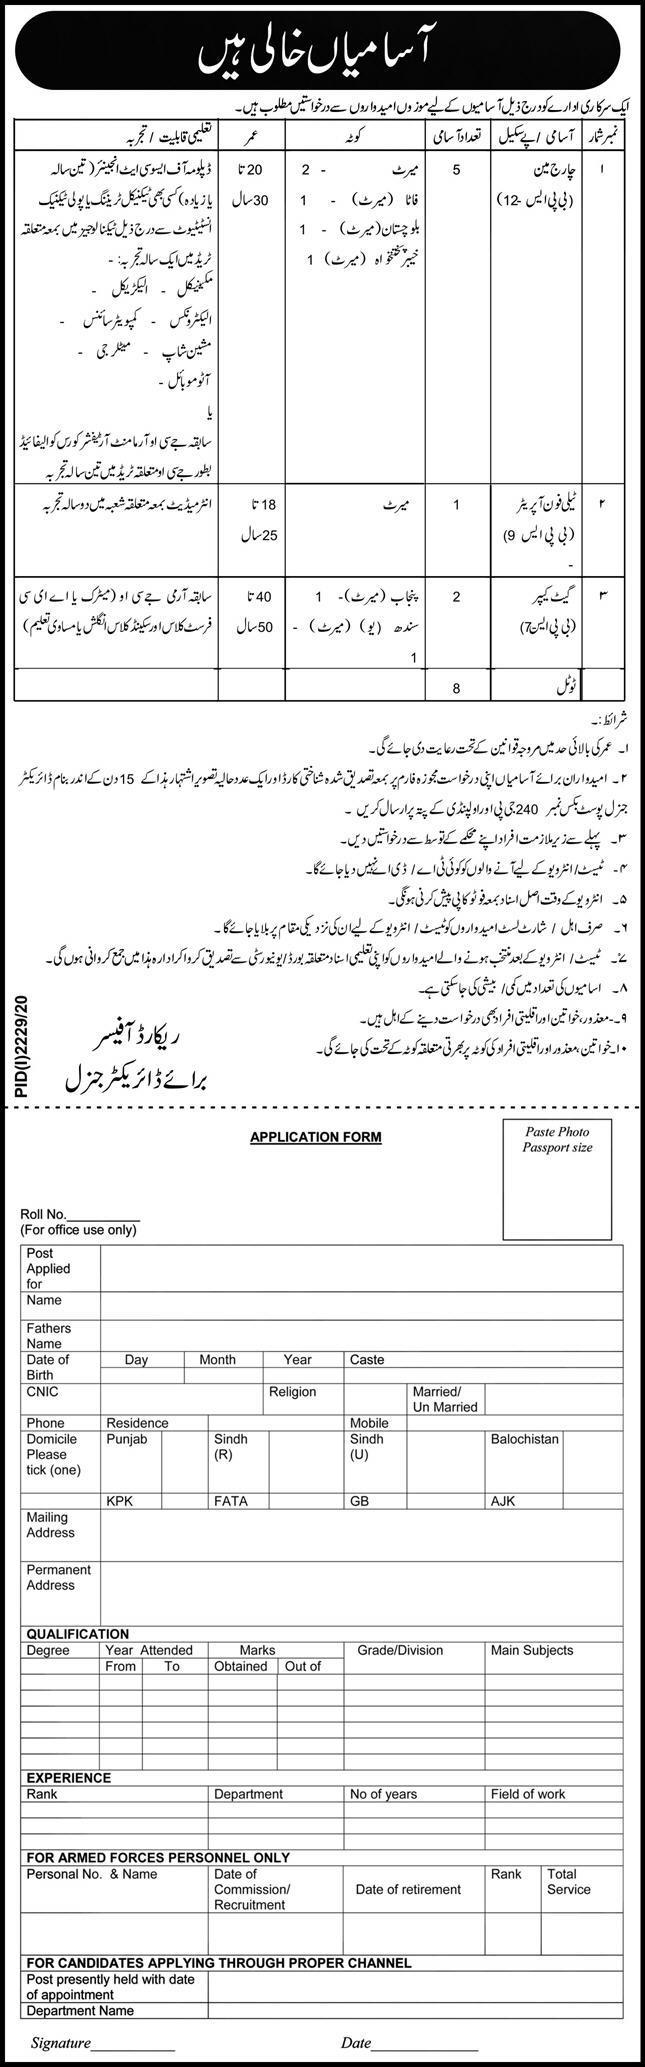 P.O Box No.240 GPO Rawalpindi Jobs 2021 Application Form Eligibility Criteria